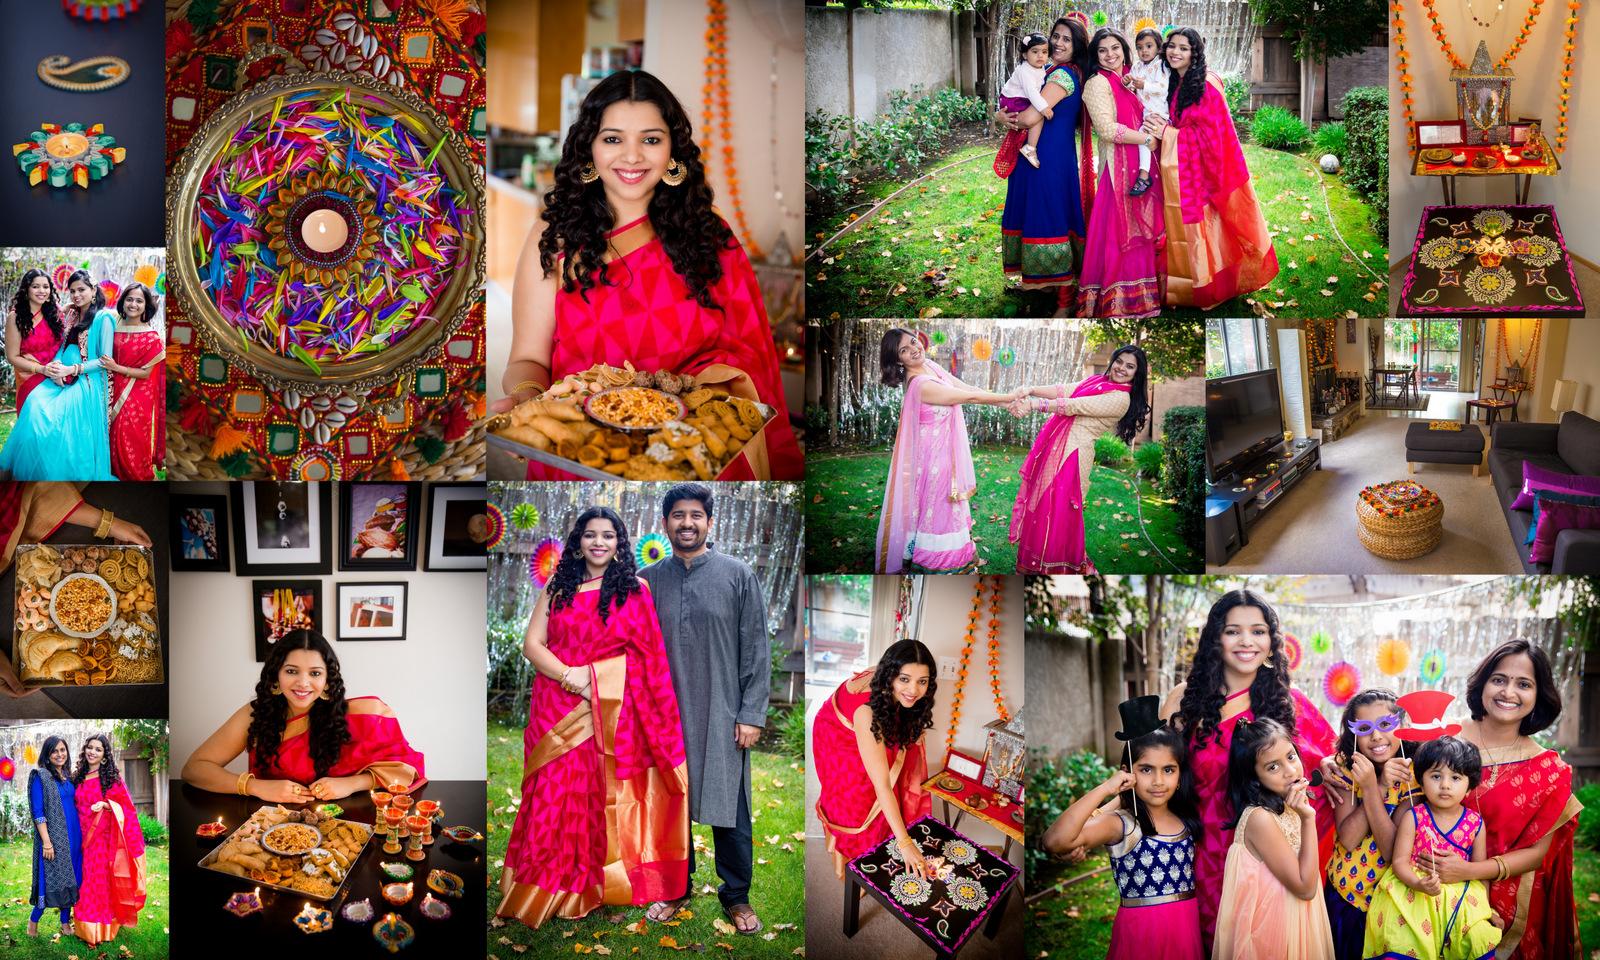 diwali 2016, diwali parties, diwali celebrations, diwali snacks, diwali food, diwali gettogether, diwali recipes